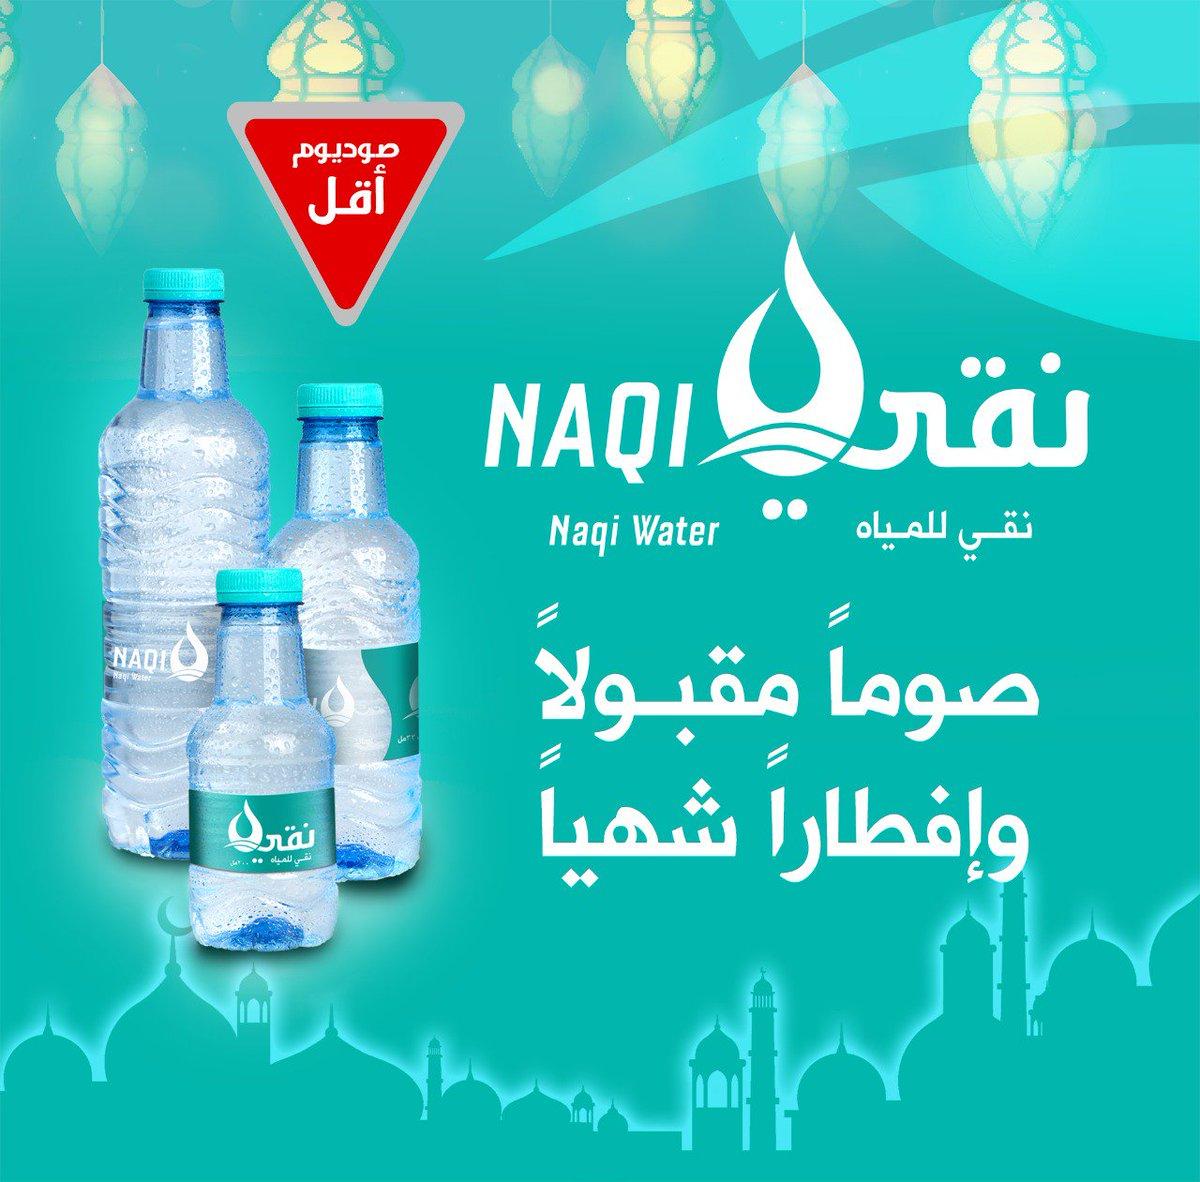 مياه نقي Naqi Water Twitter